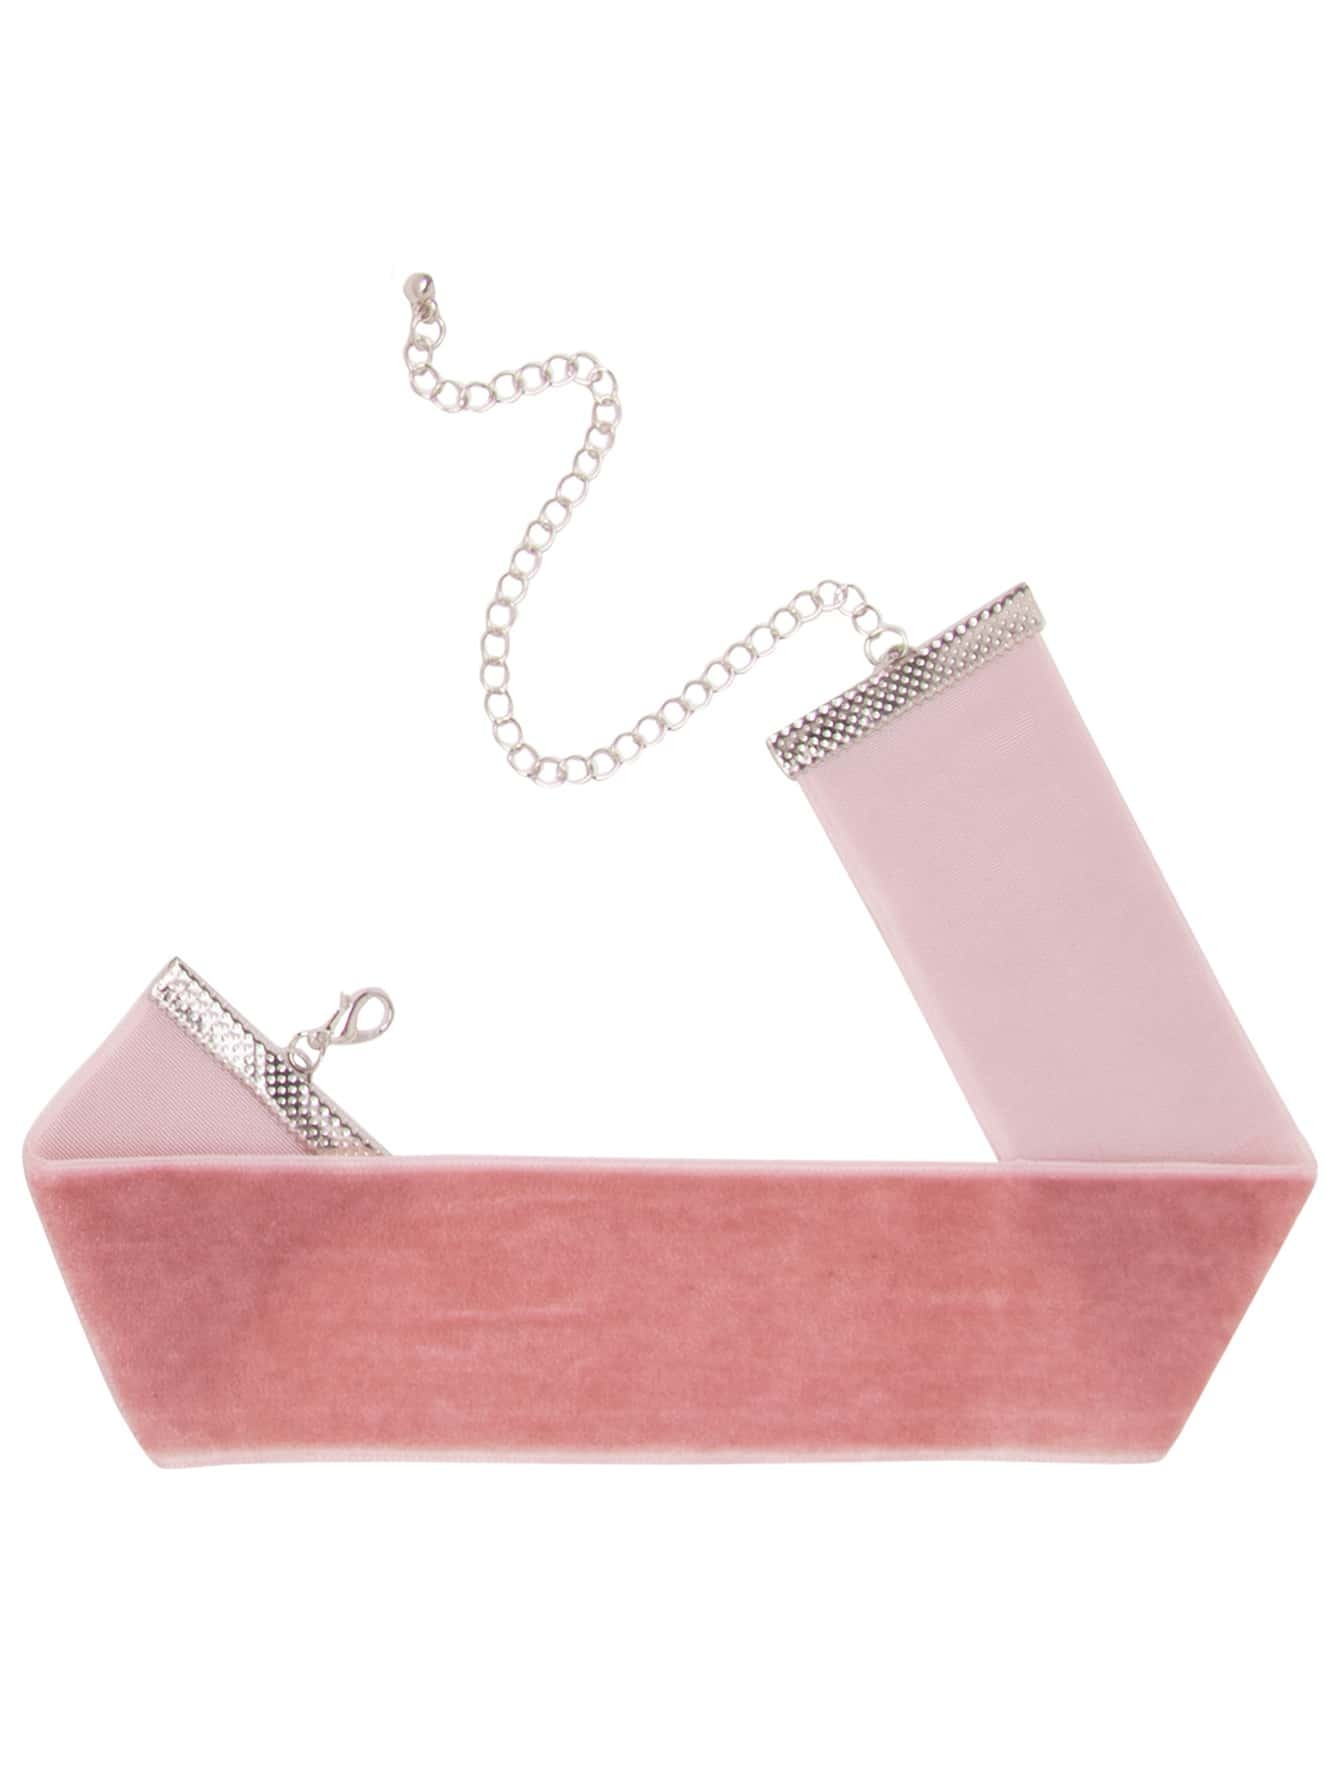 necklacenc160815310_1